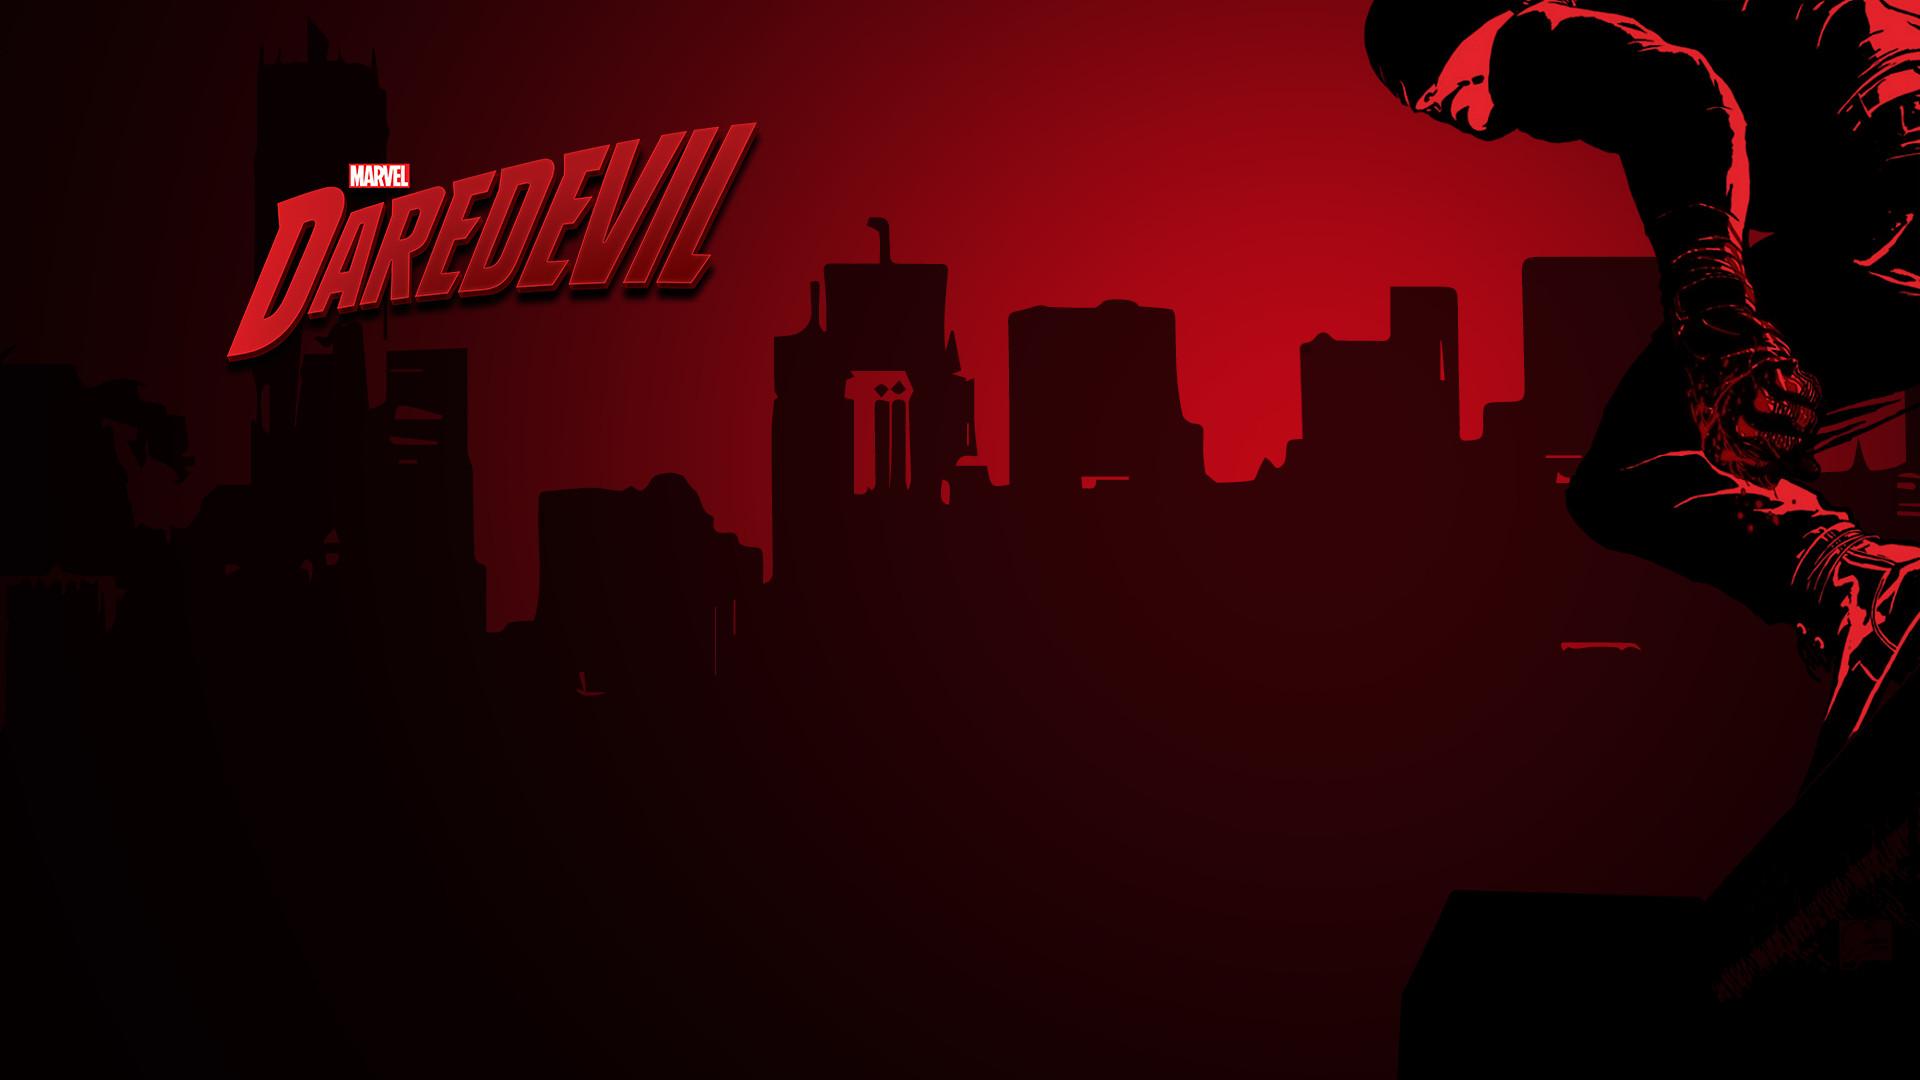 Daredevil Wallpapers ①